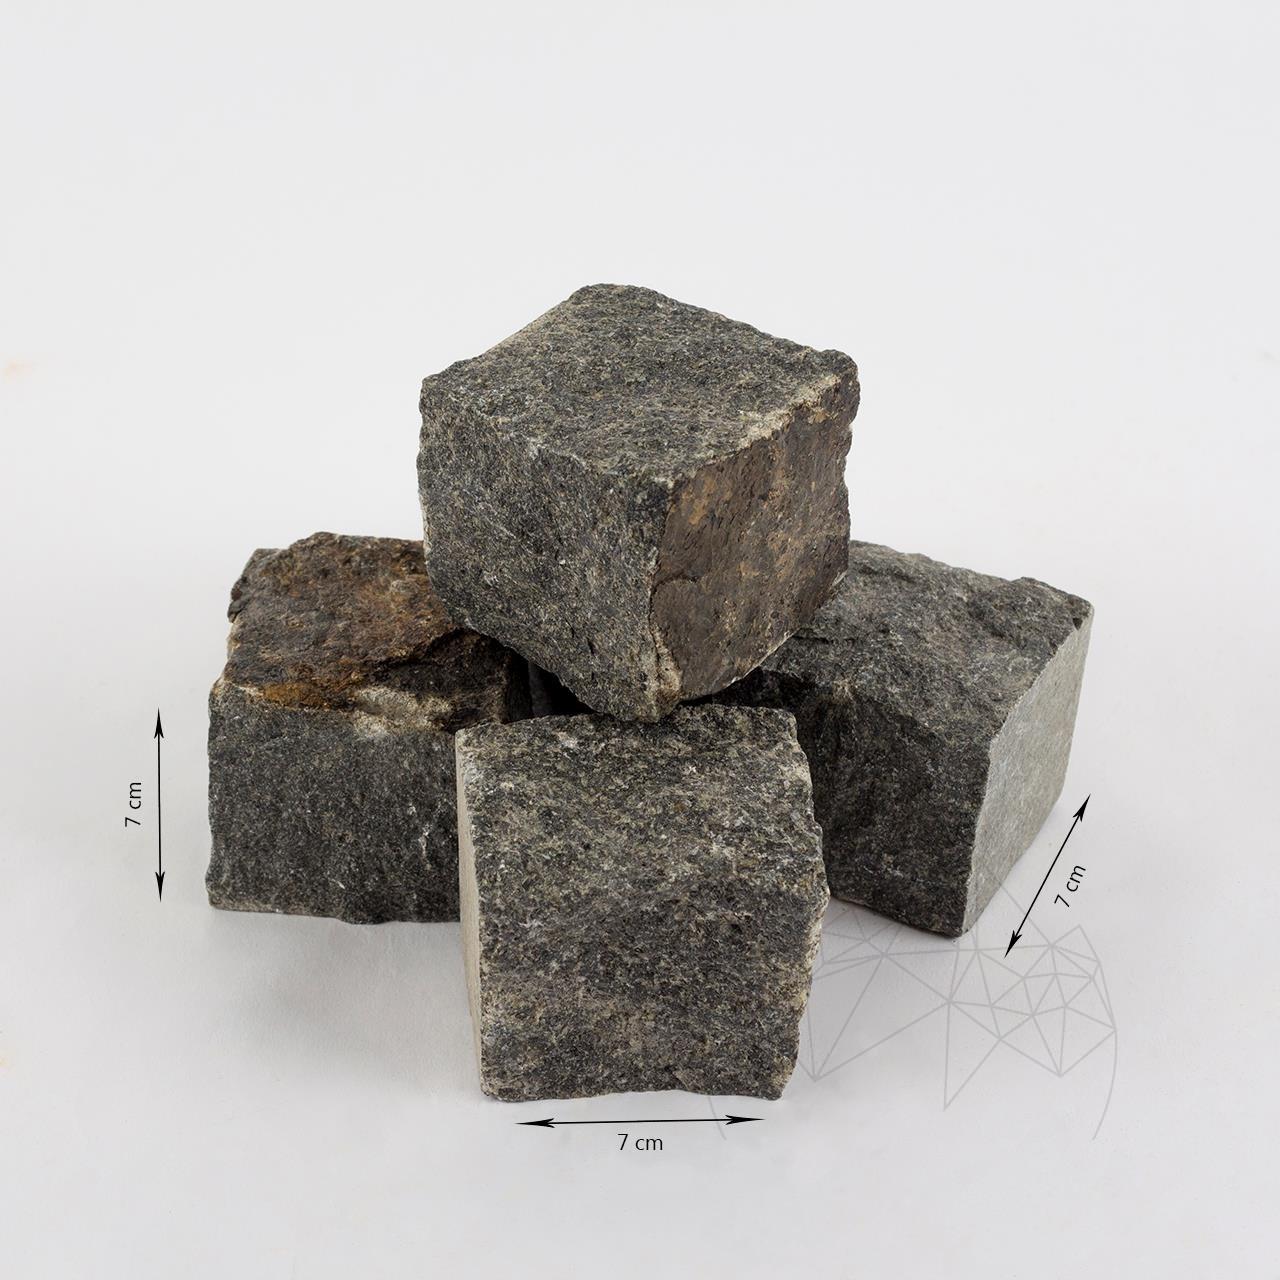 Anthracite Granite Splitface Cobblestone 7 x 7 x 7 cm (1 ton = 5-6 sqm) title=Anthracite Granite Splitface Cobblestone 7 x 7 x 7 cm (1 ton = 5-6 sqm)